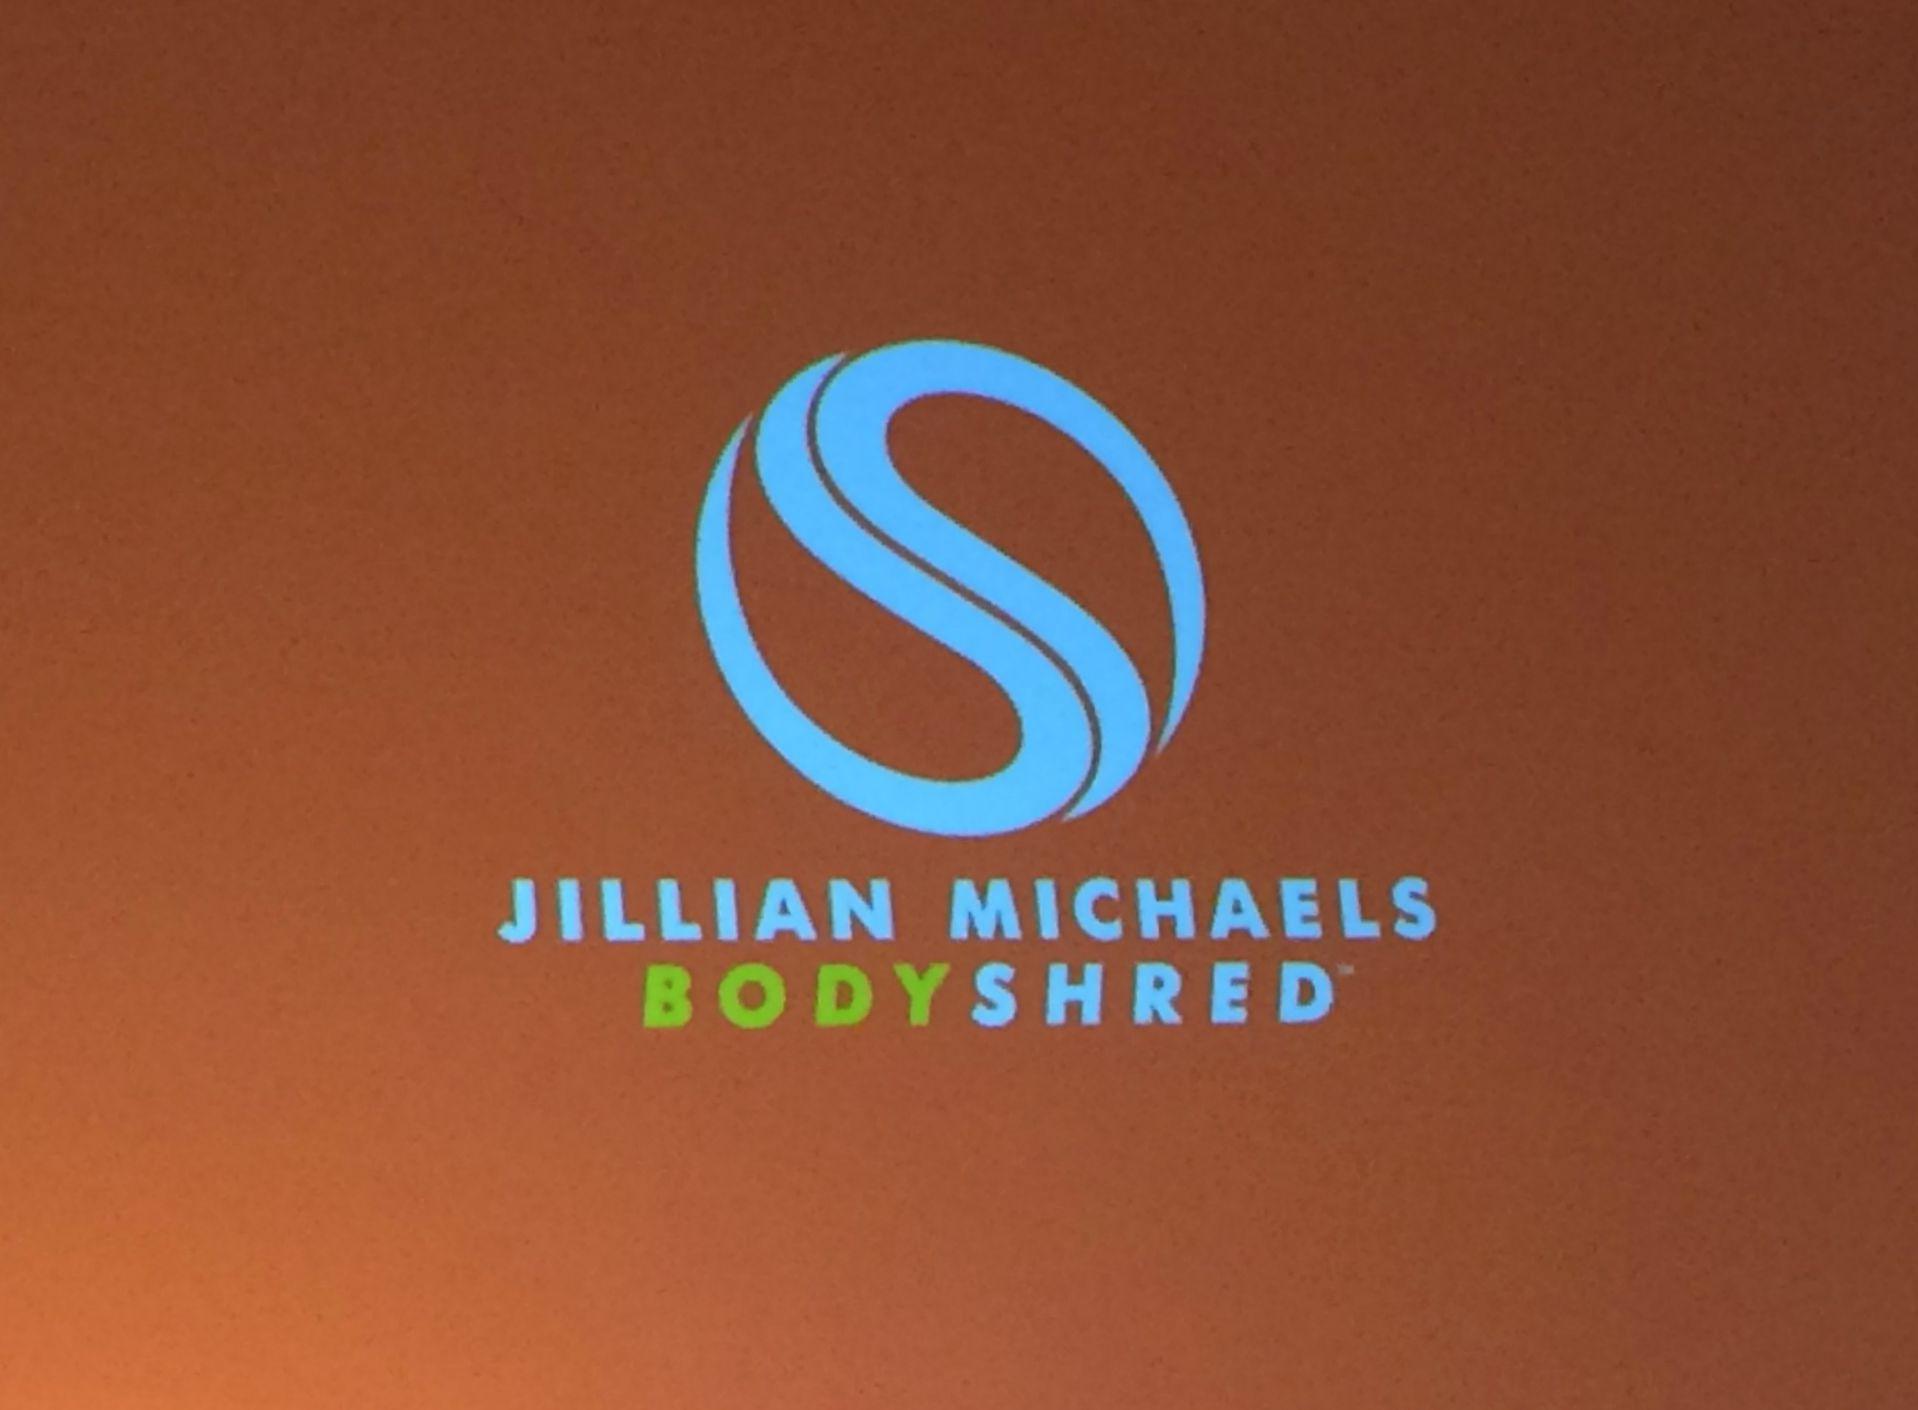 Jillian Michaels Body Shred at IDEA